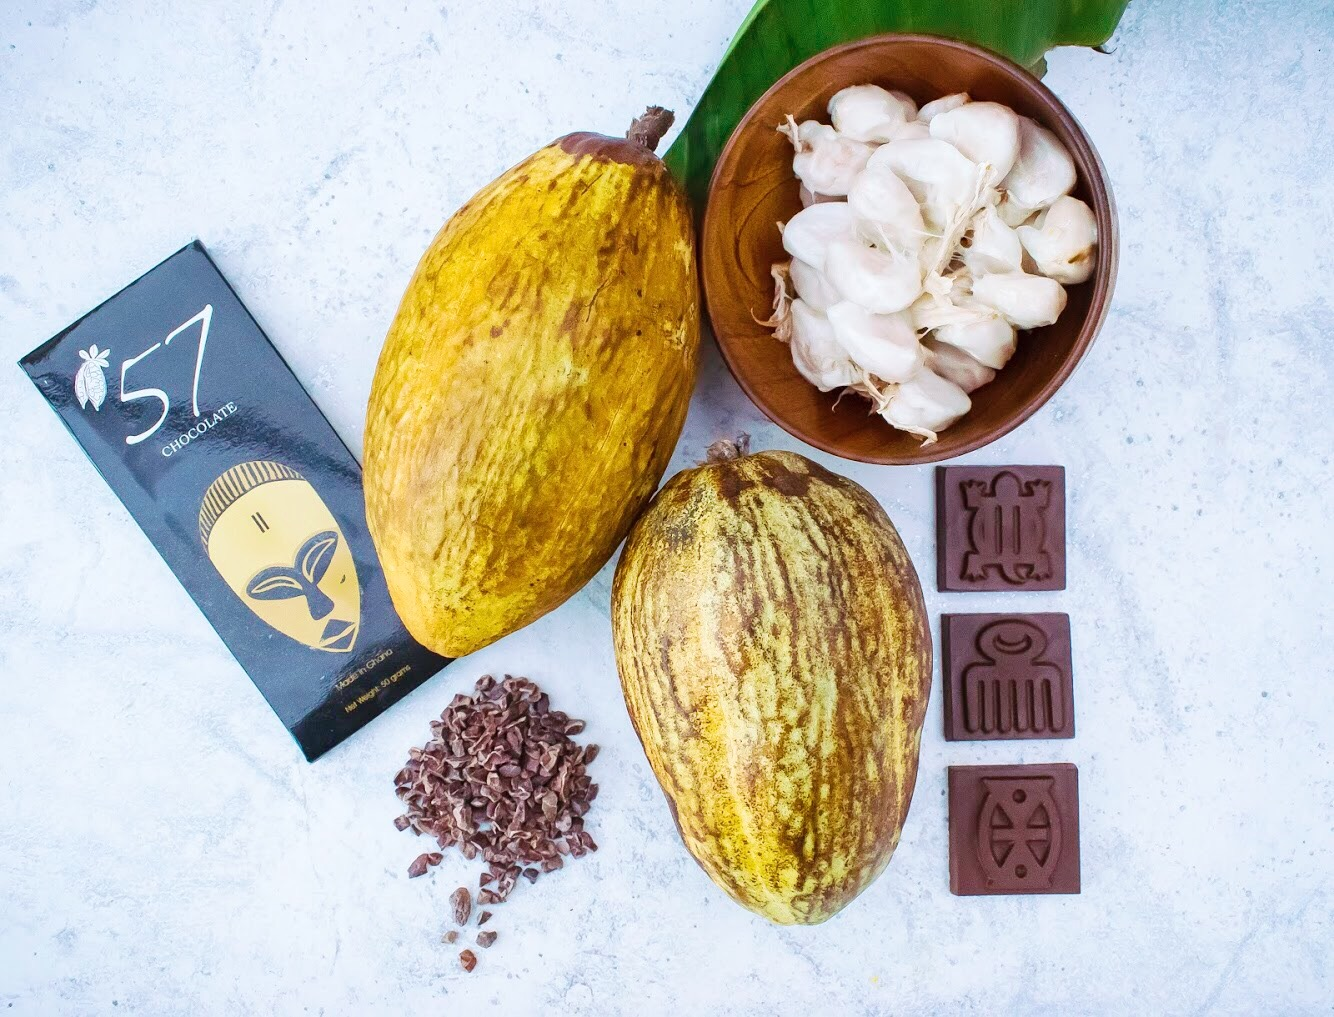 Copy of Milk Chocolate.jpg